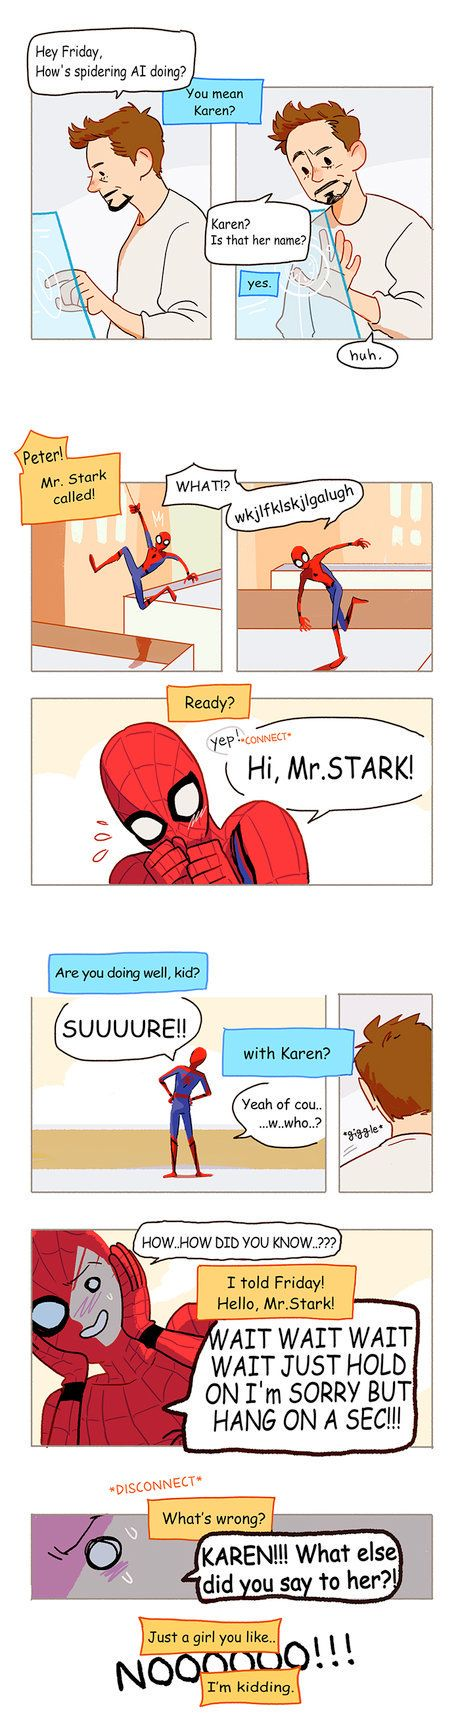 You Did Good, Kid. - Superheroes - superheroes, batman, superman, avengers,  spiderman, Pokémon GO